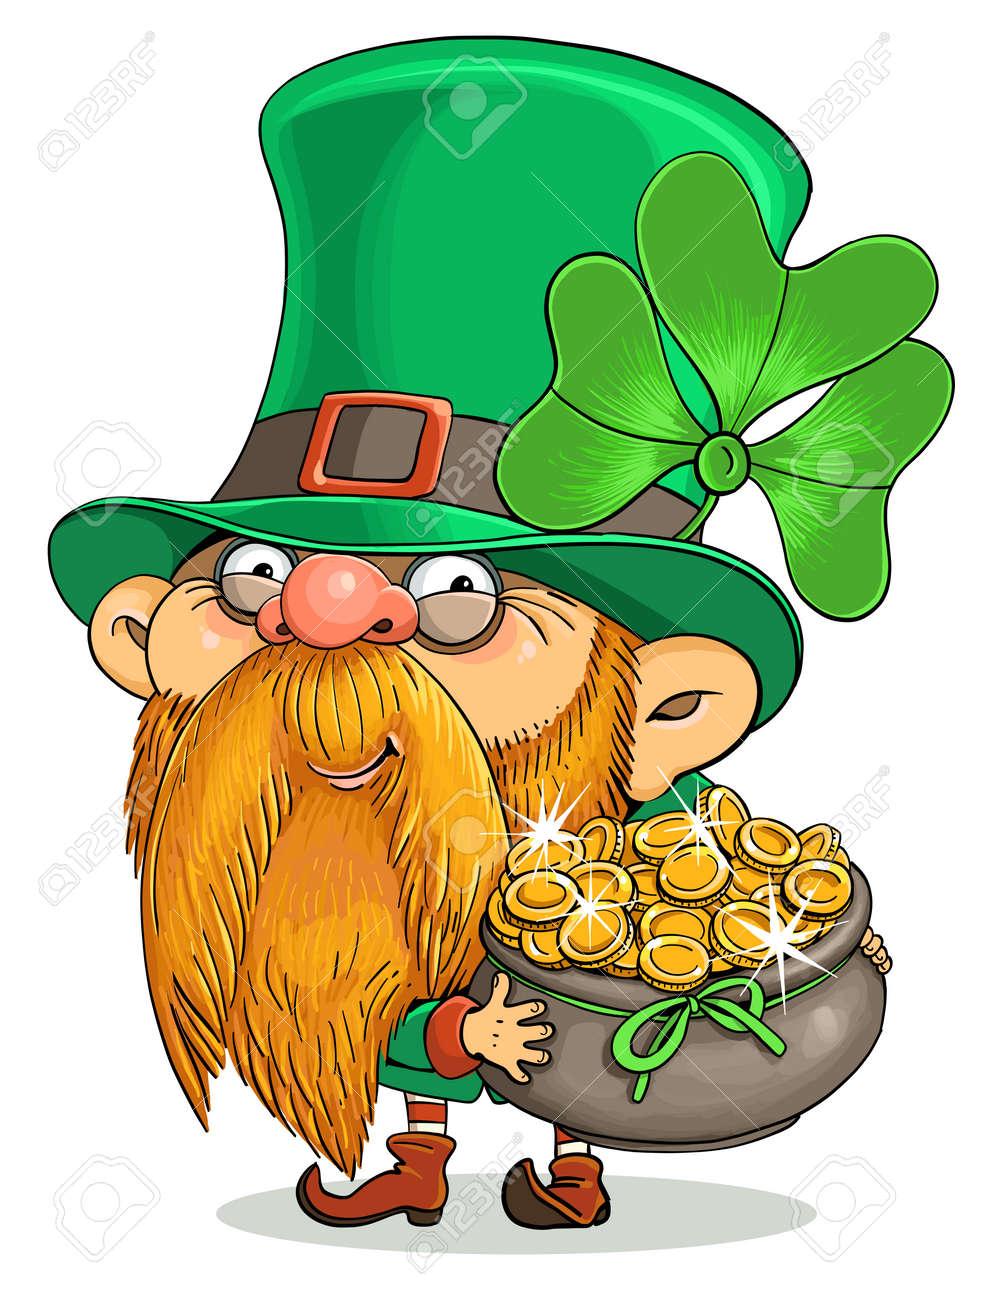 Vector cartoon. Postcard for St. Patrick's Day. Cute Irish Leprechaun and a pot of gold coins. - 164427955